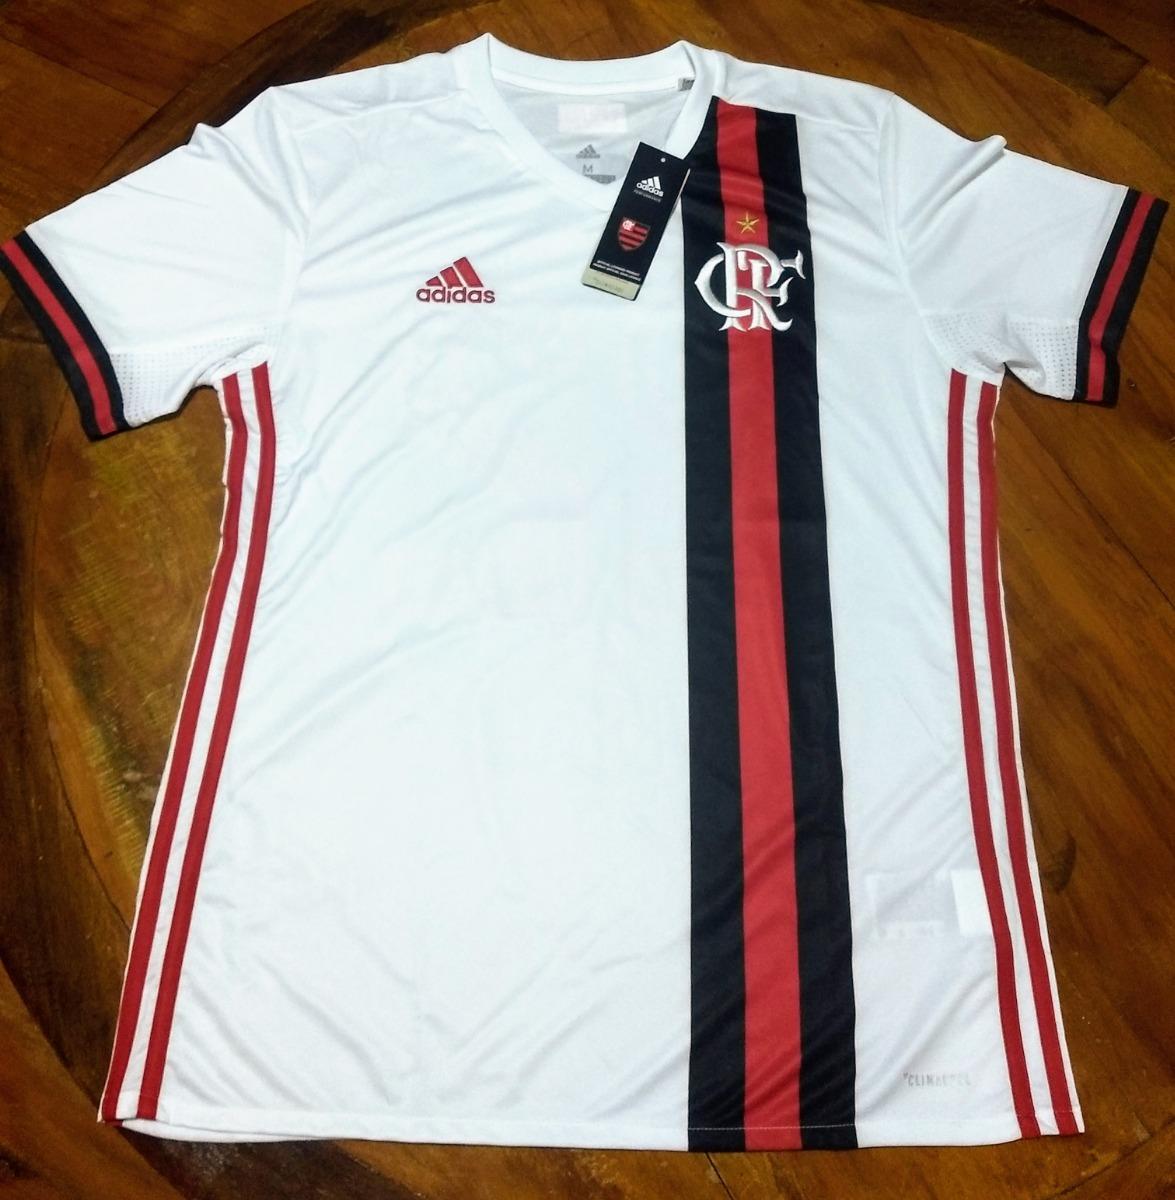 0bc3e2097a Camisa Oficial Flamengo 2017 2 Ii Cr Crf 100% Original - R  109